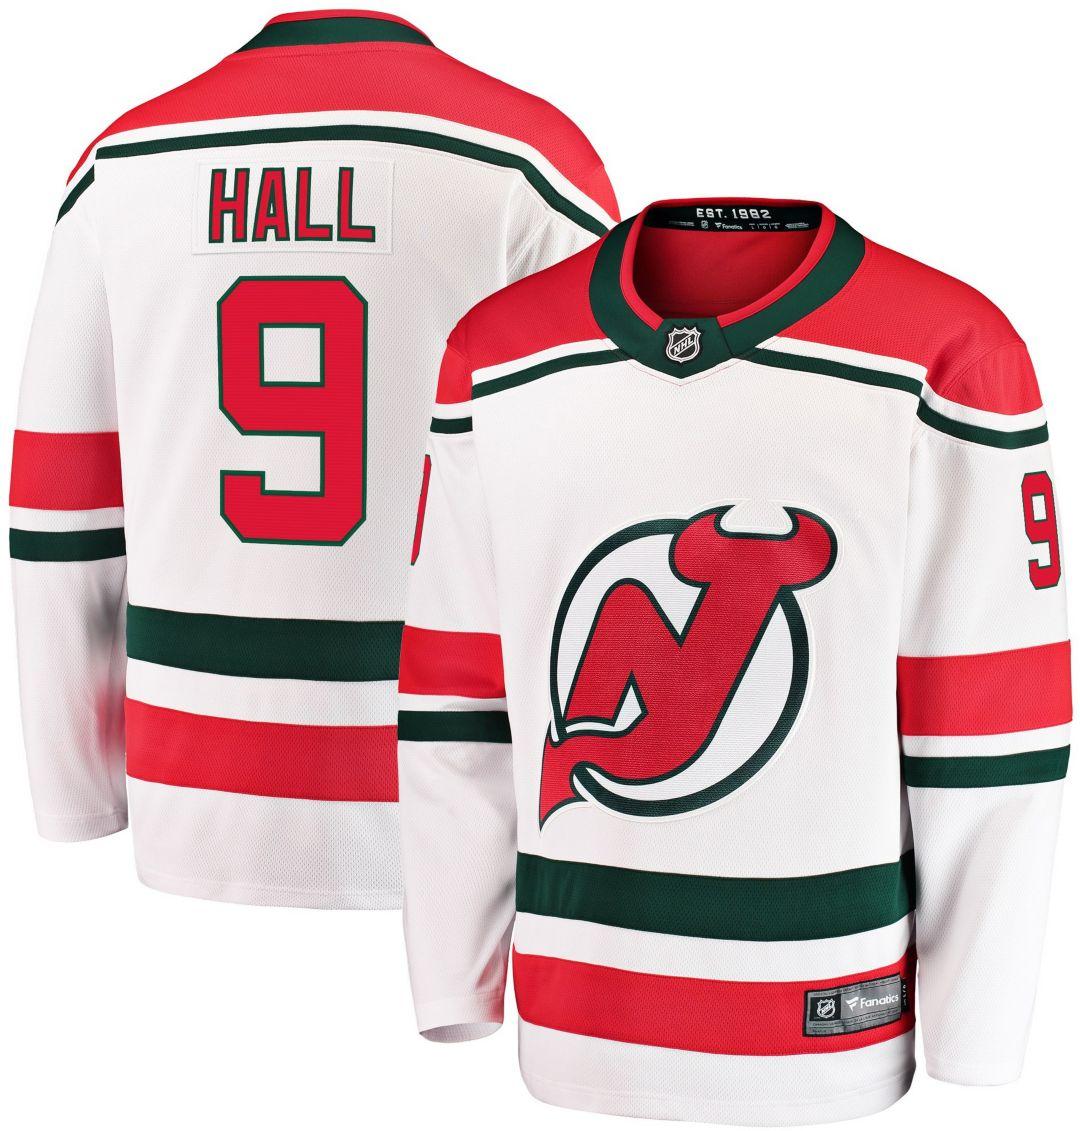 finest selection af734 0f170 NHL Men's New Jersey Devils Taylor Hall #9 Breakaway Retro Replica Jersey